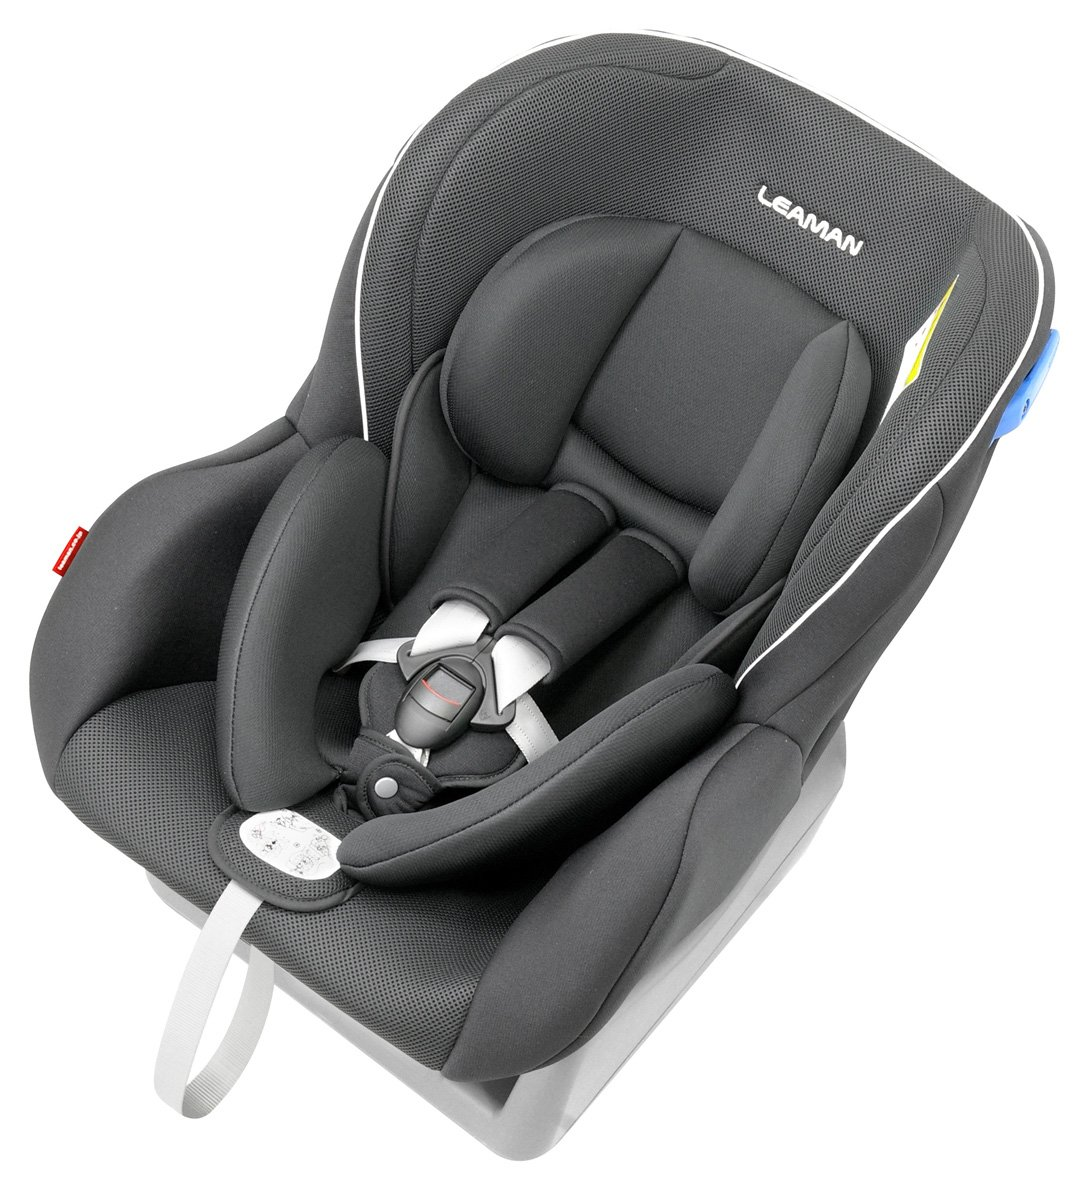 Lehman CF314 associations 3 child seat pure black